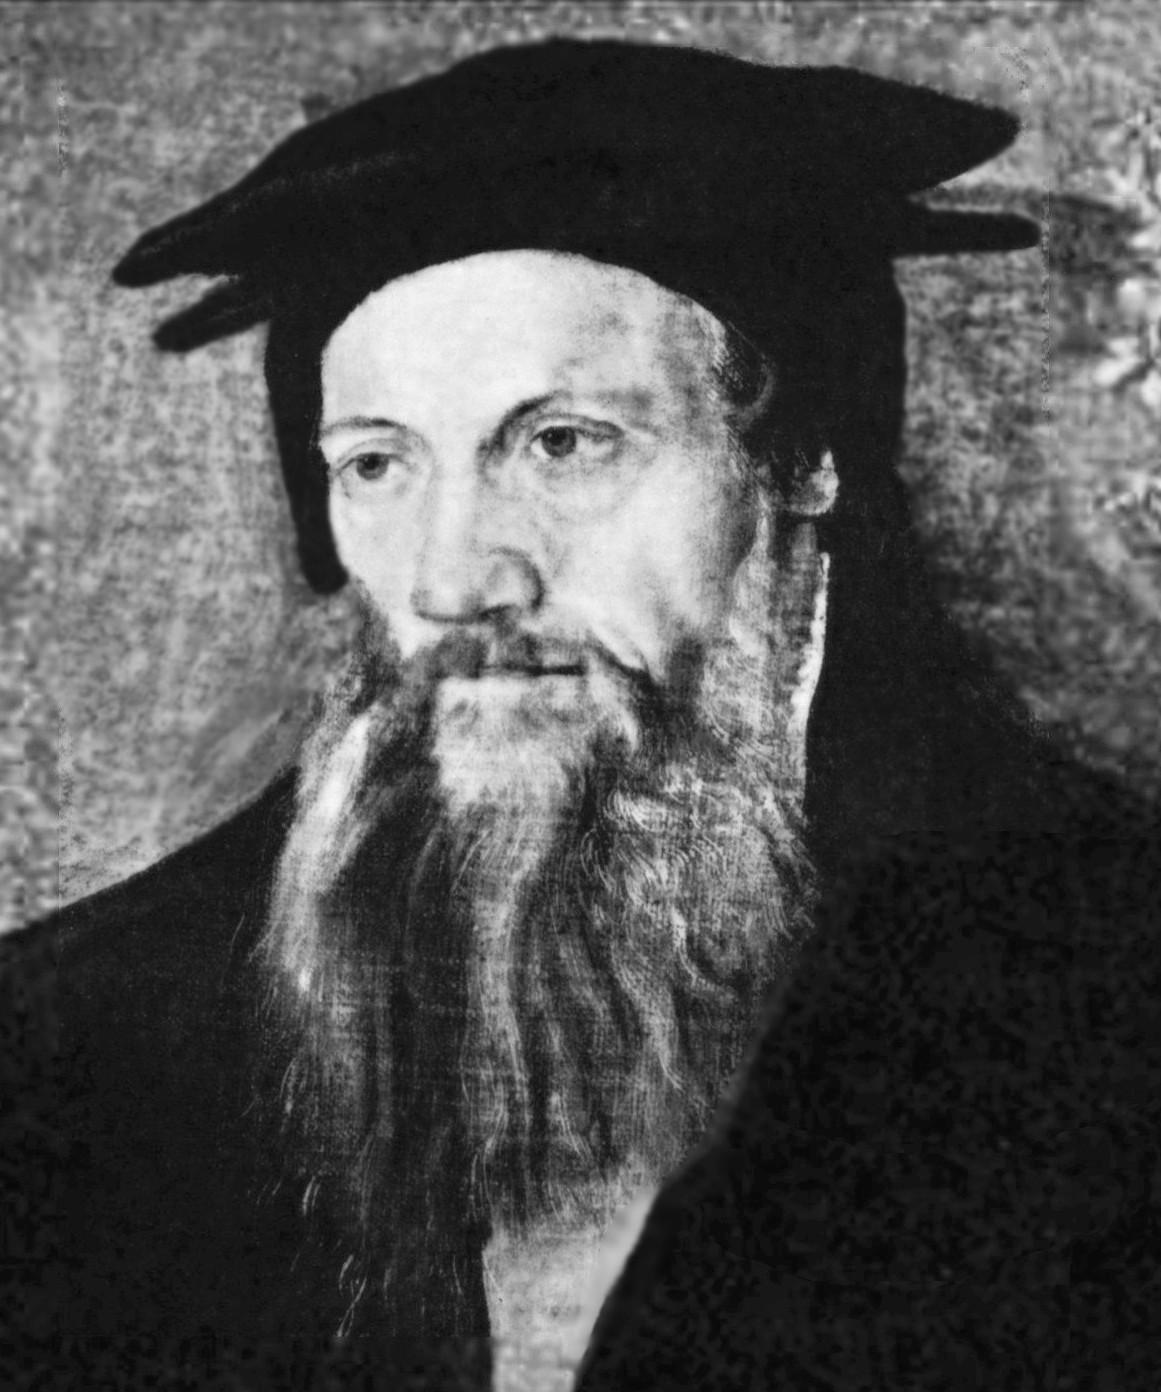 Portrait by [[Tobias Stimmer]], c. 1564